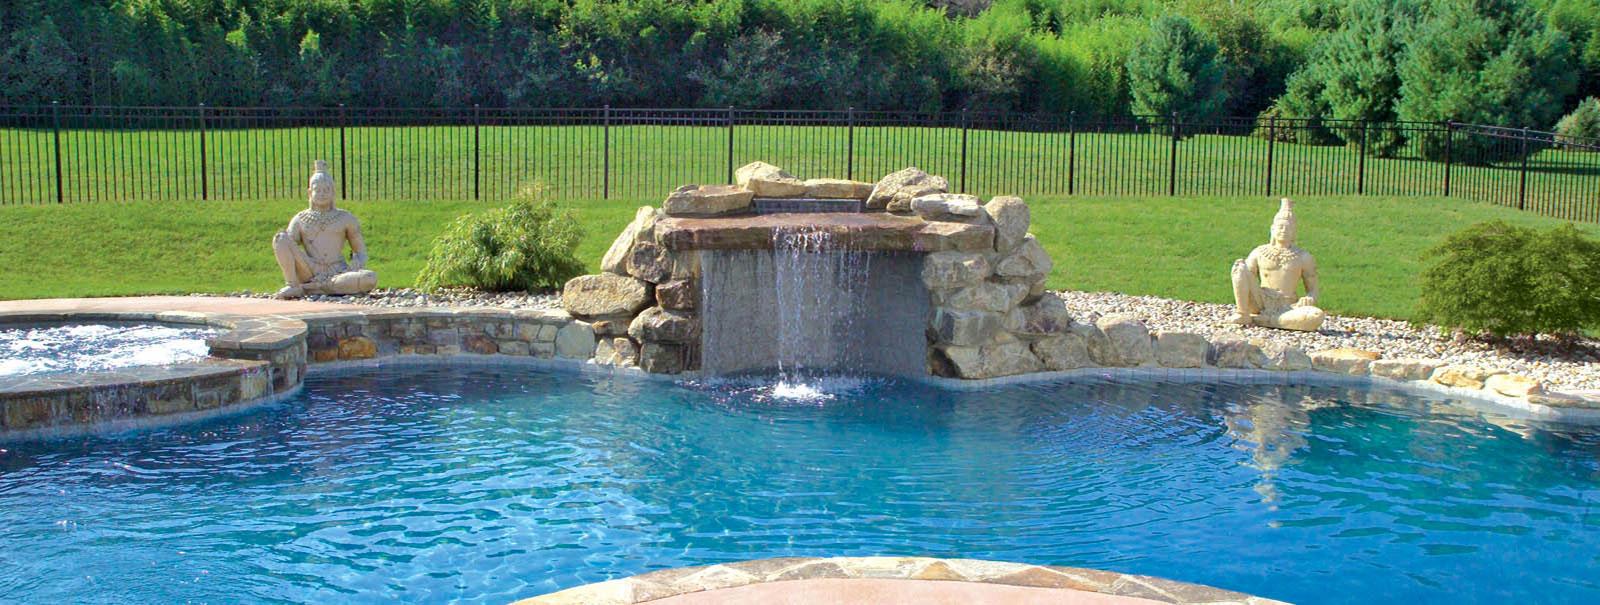 hatfield-swimming-pool2